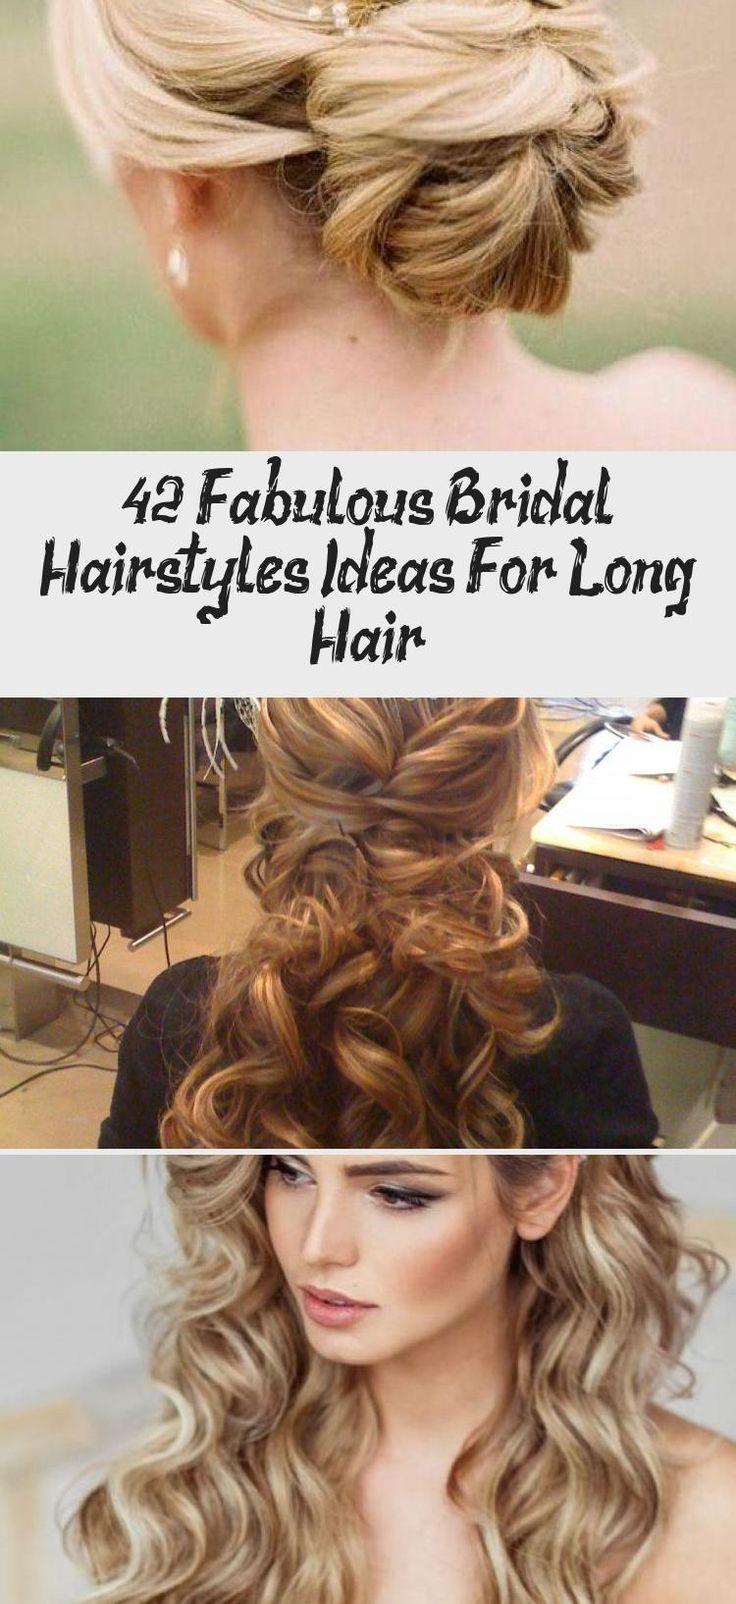 42 Fabulous Bridal Hairstyles Ideas For Long Hair #bridesmaidhairBrunette #bridesmaidhairWithFlower #bridesmaidhairMessy #bridesmaidhairBraid #bridesmaidhairSleek